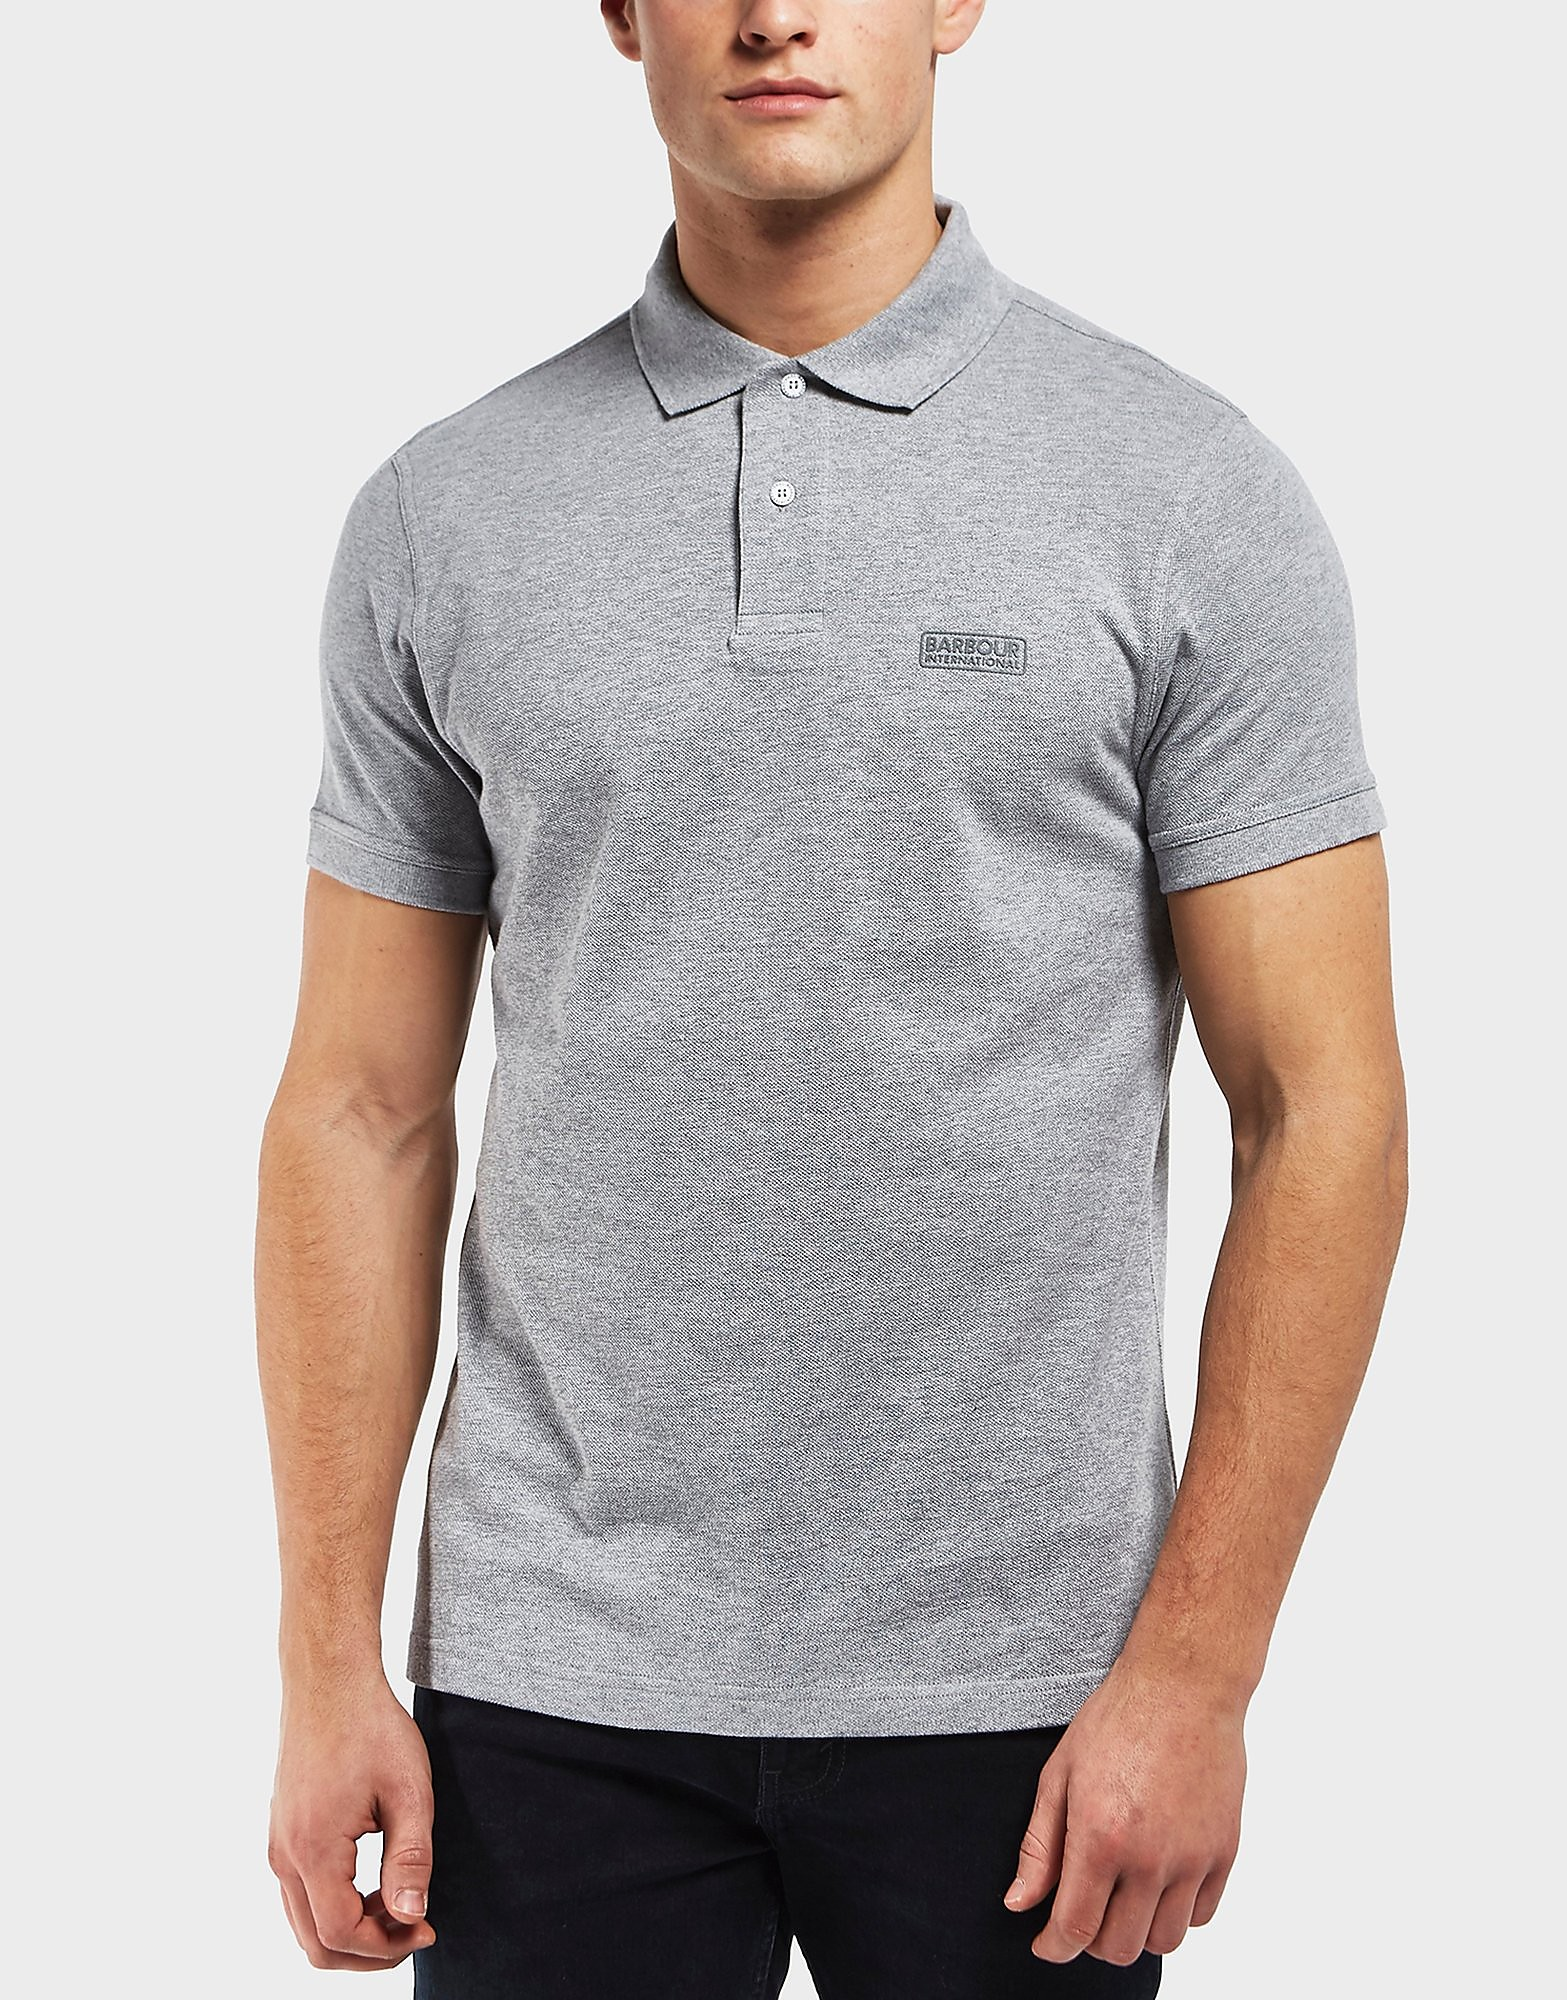 Barbour International Short Sleeve Pique Polo Shirt